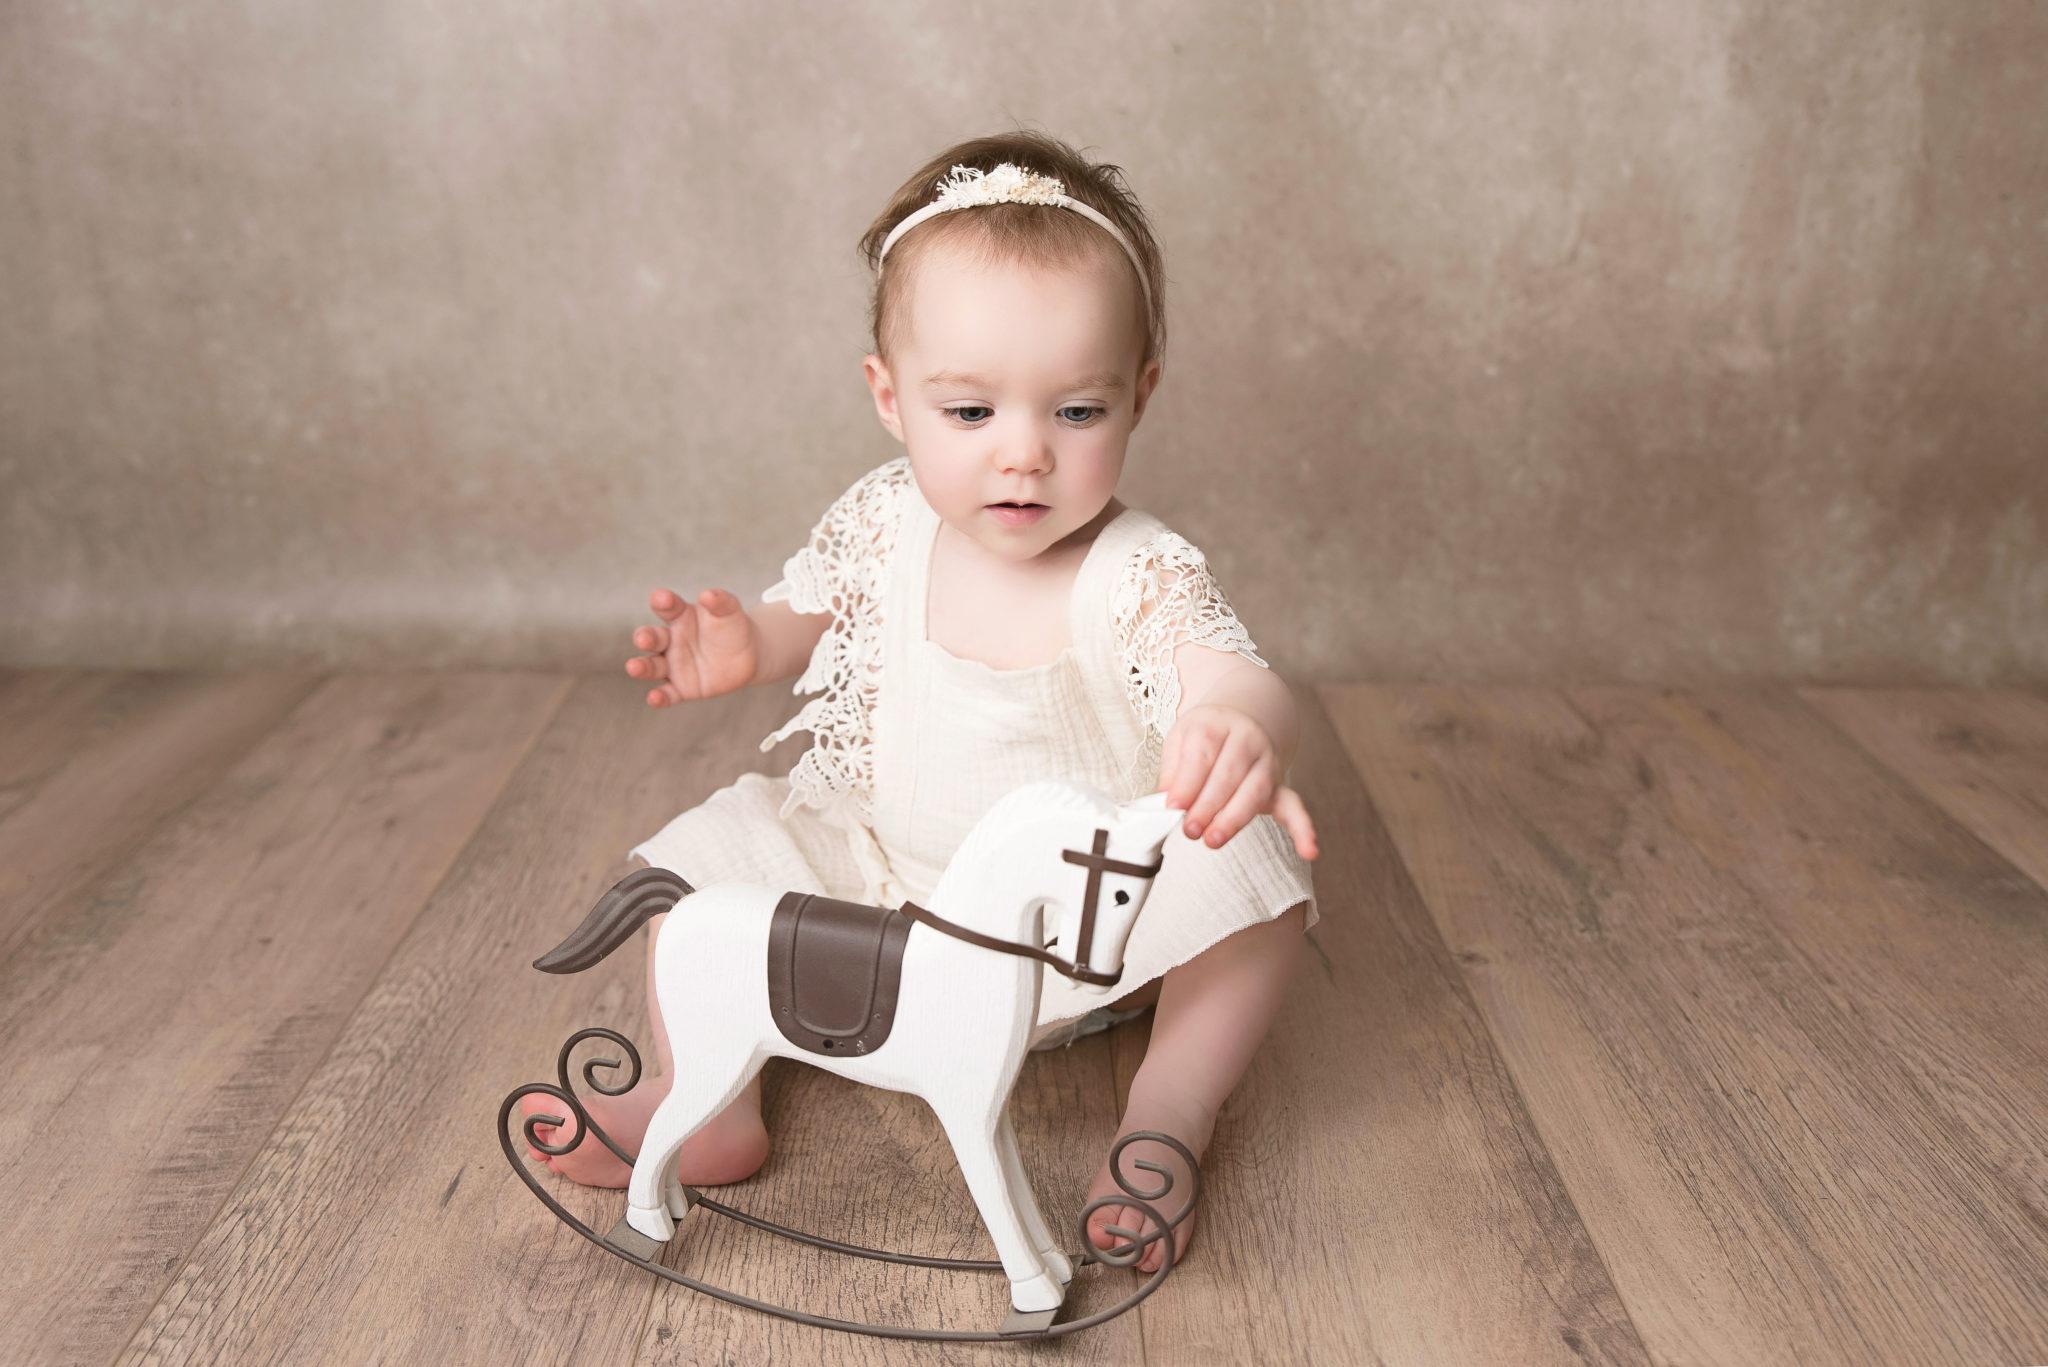 Photographe bébé oise seine et marne val d'oise ainse (29)